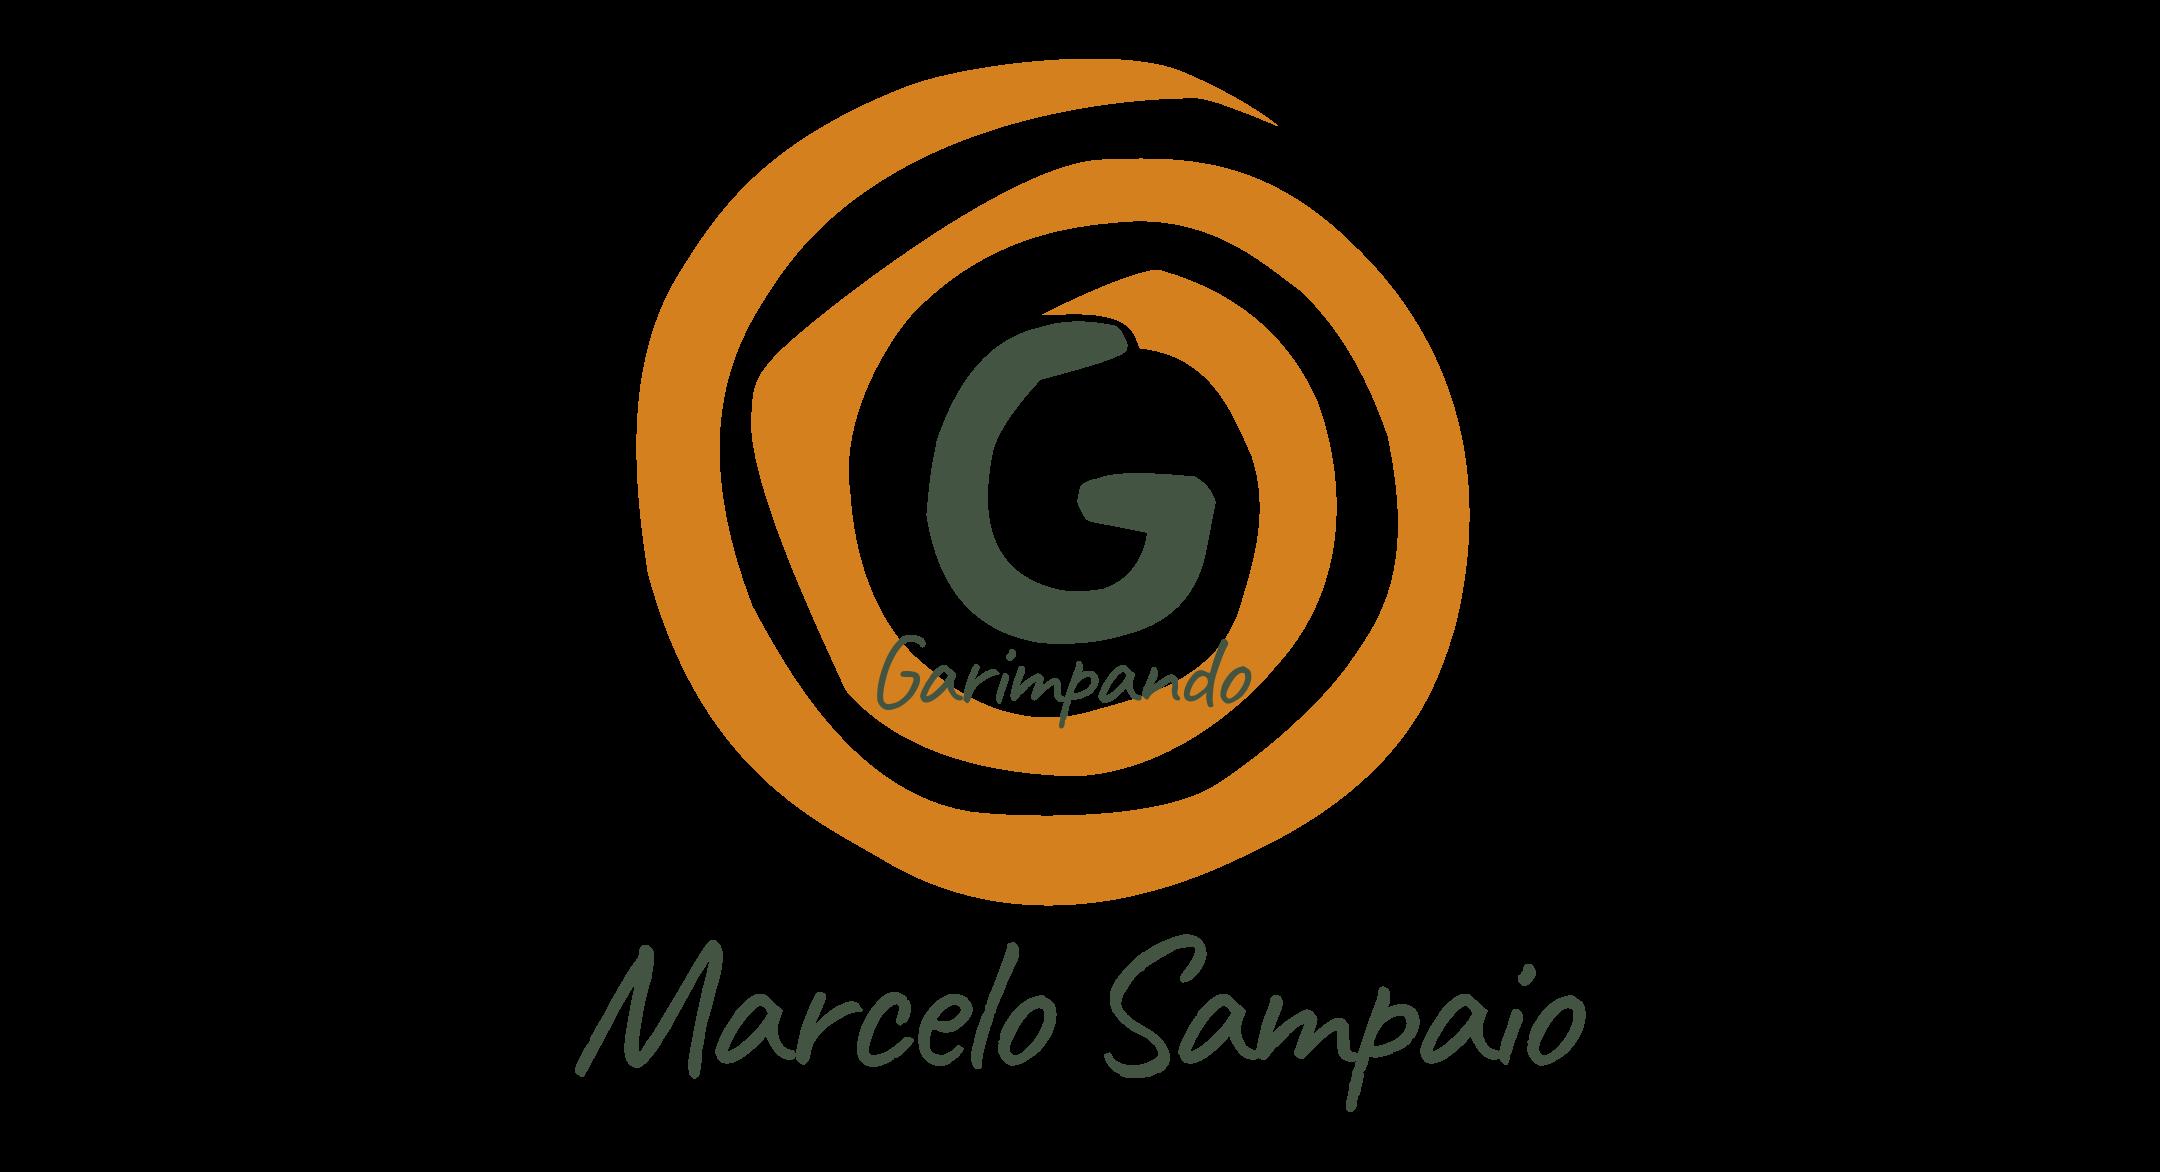 Garimpando – Marcelo Sampaio